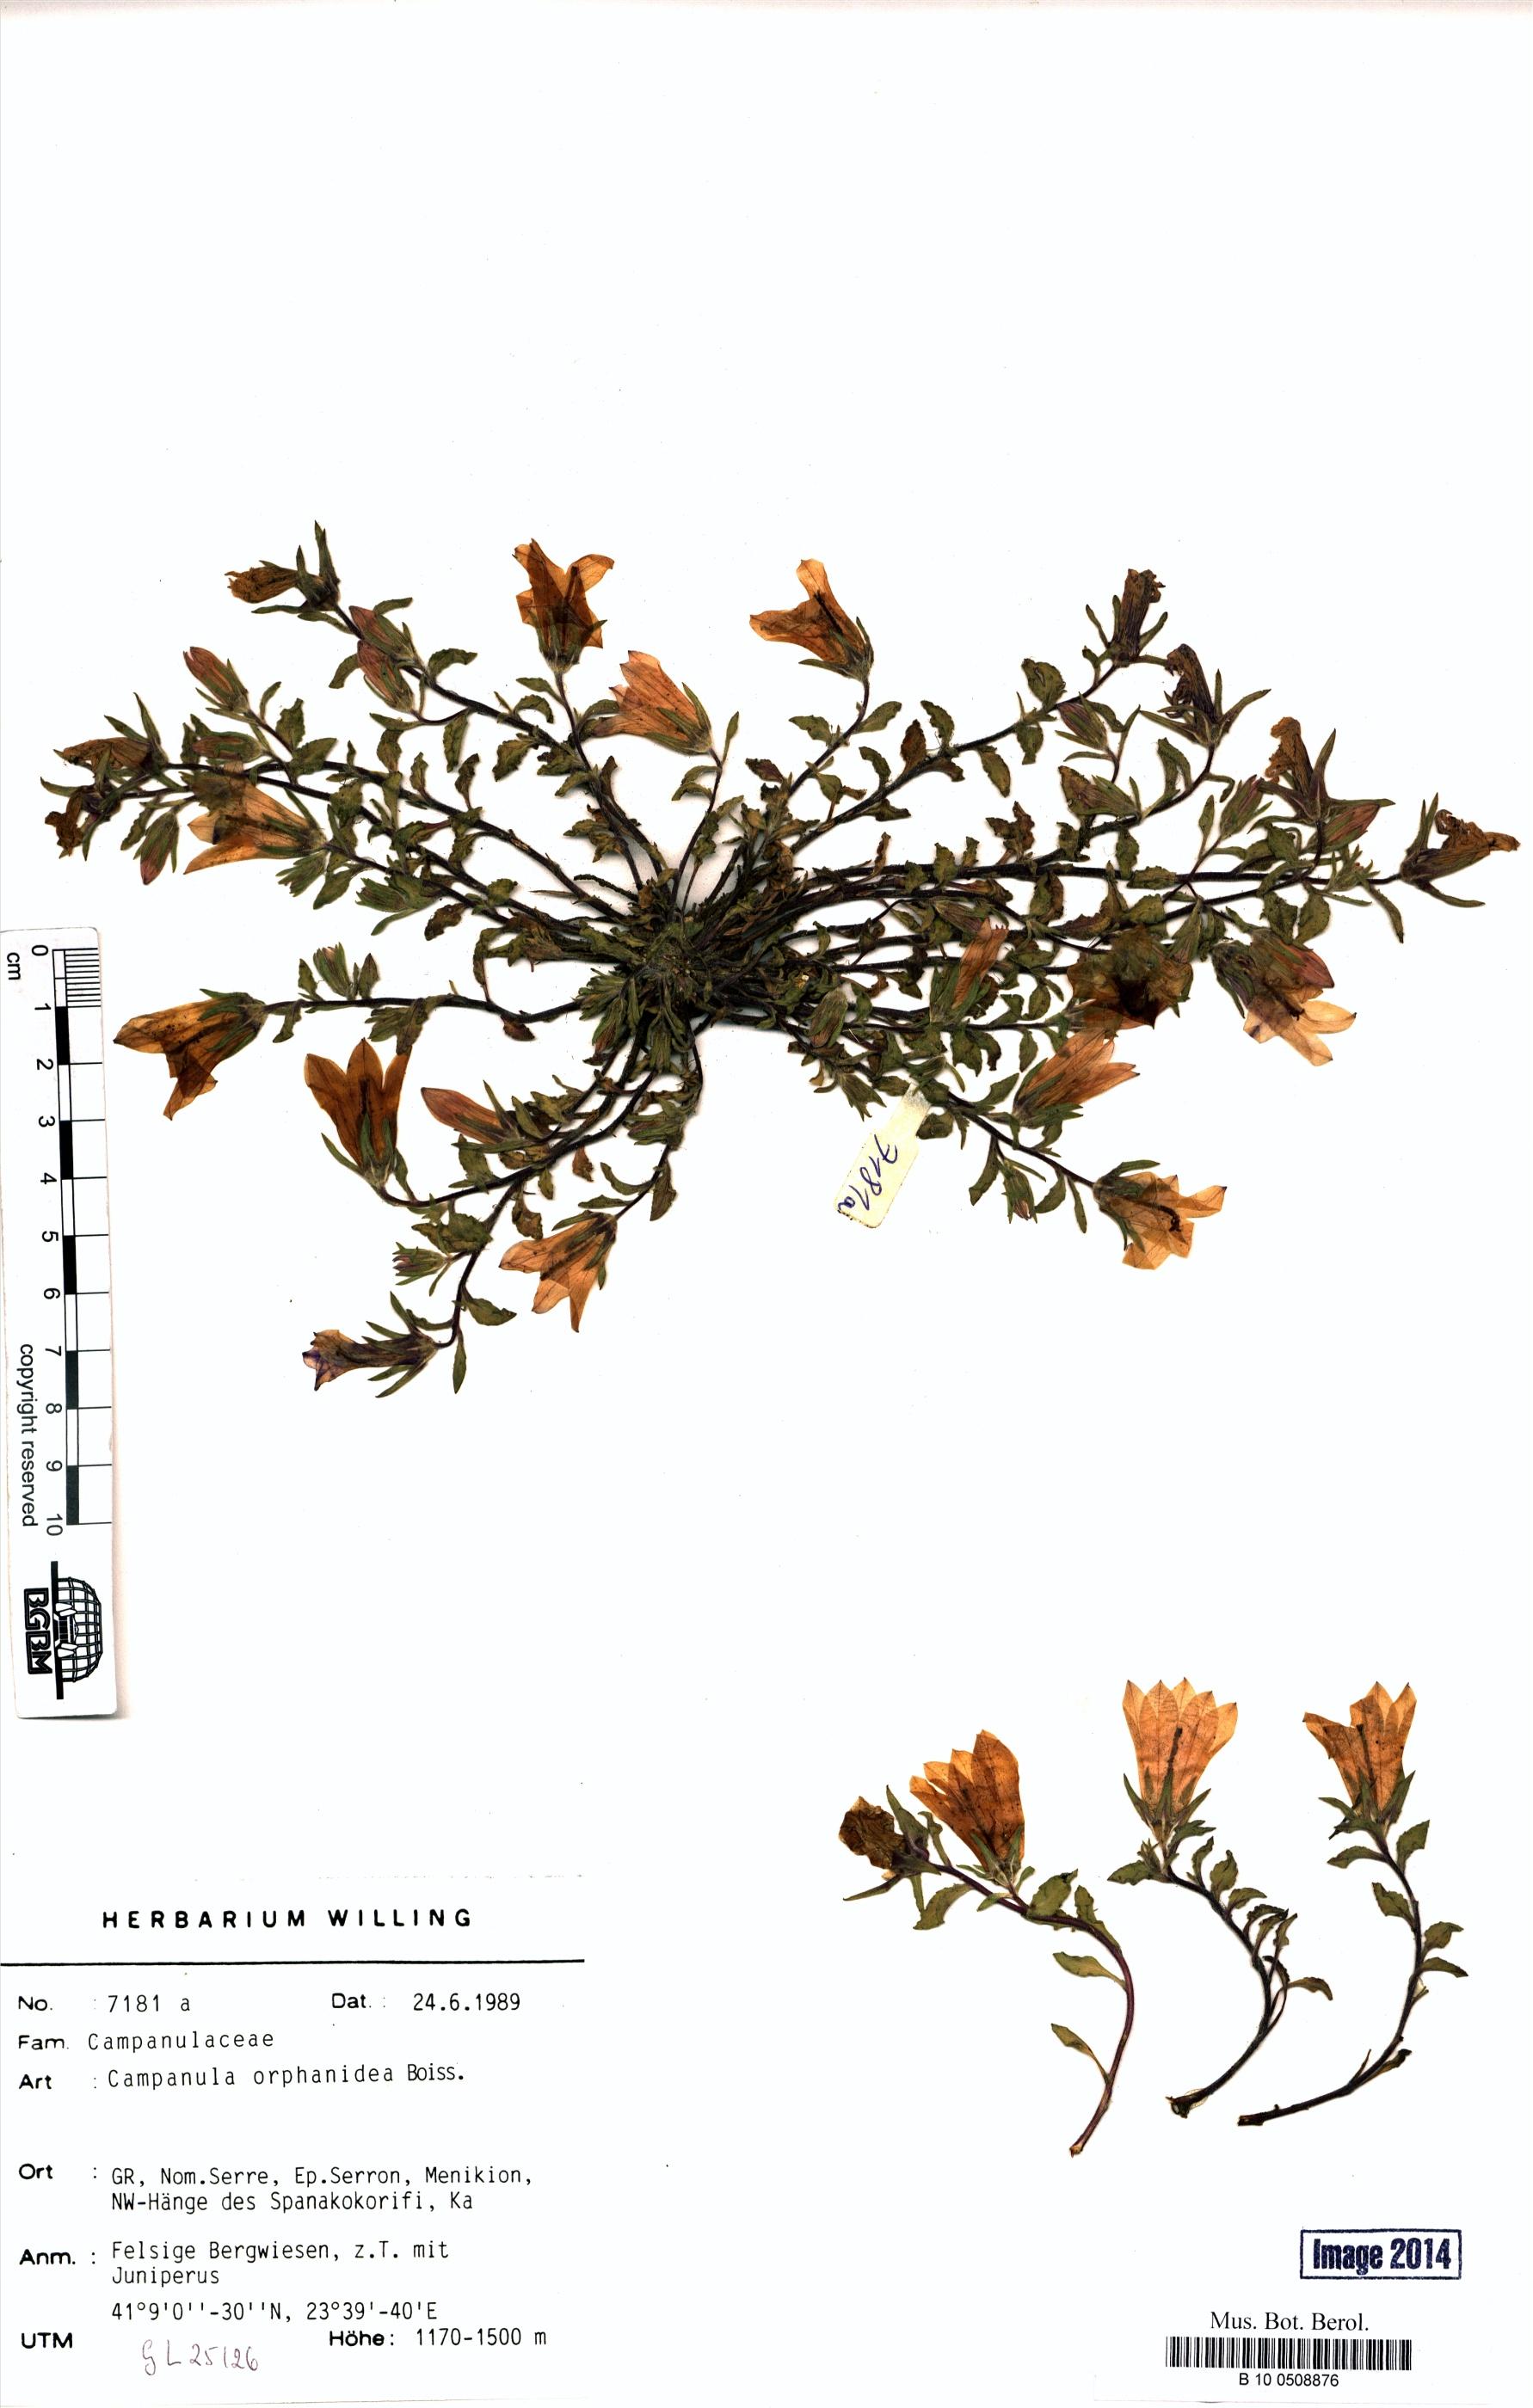 http://ww2.bgbm.org/herbarium/images/B/10/05/08/87/B_10_0508876.jpg